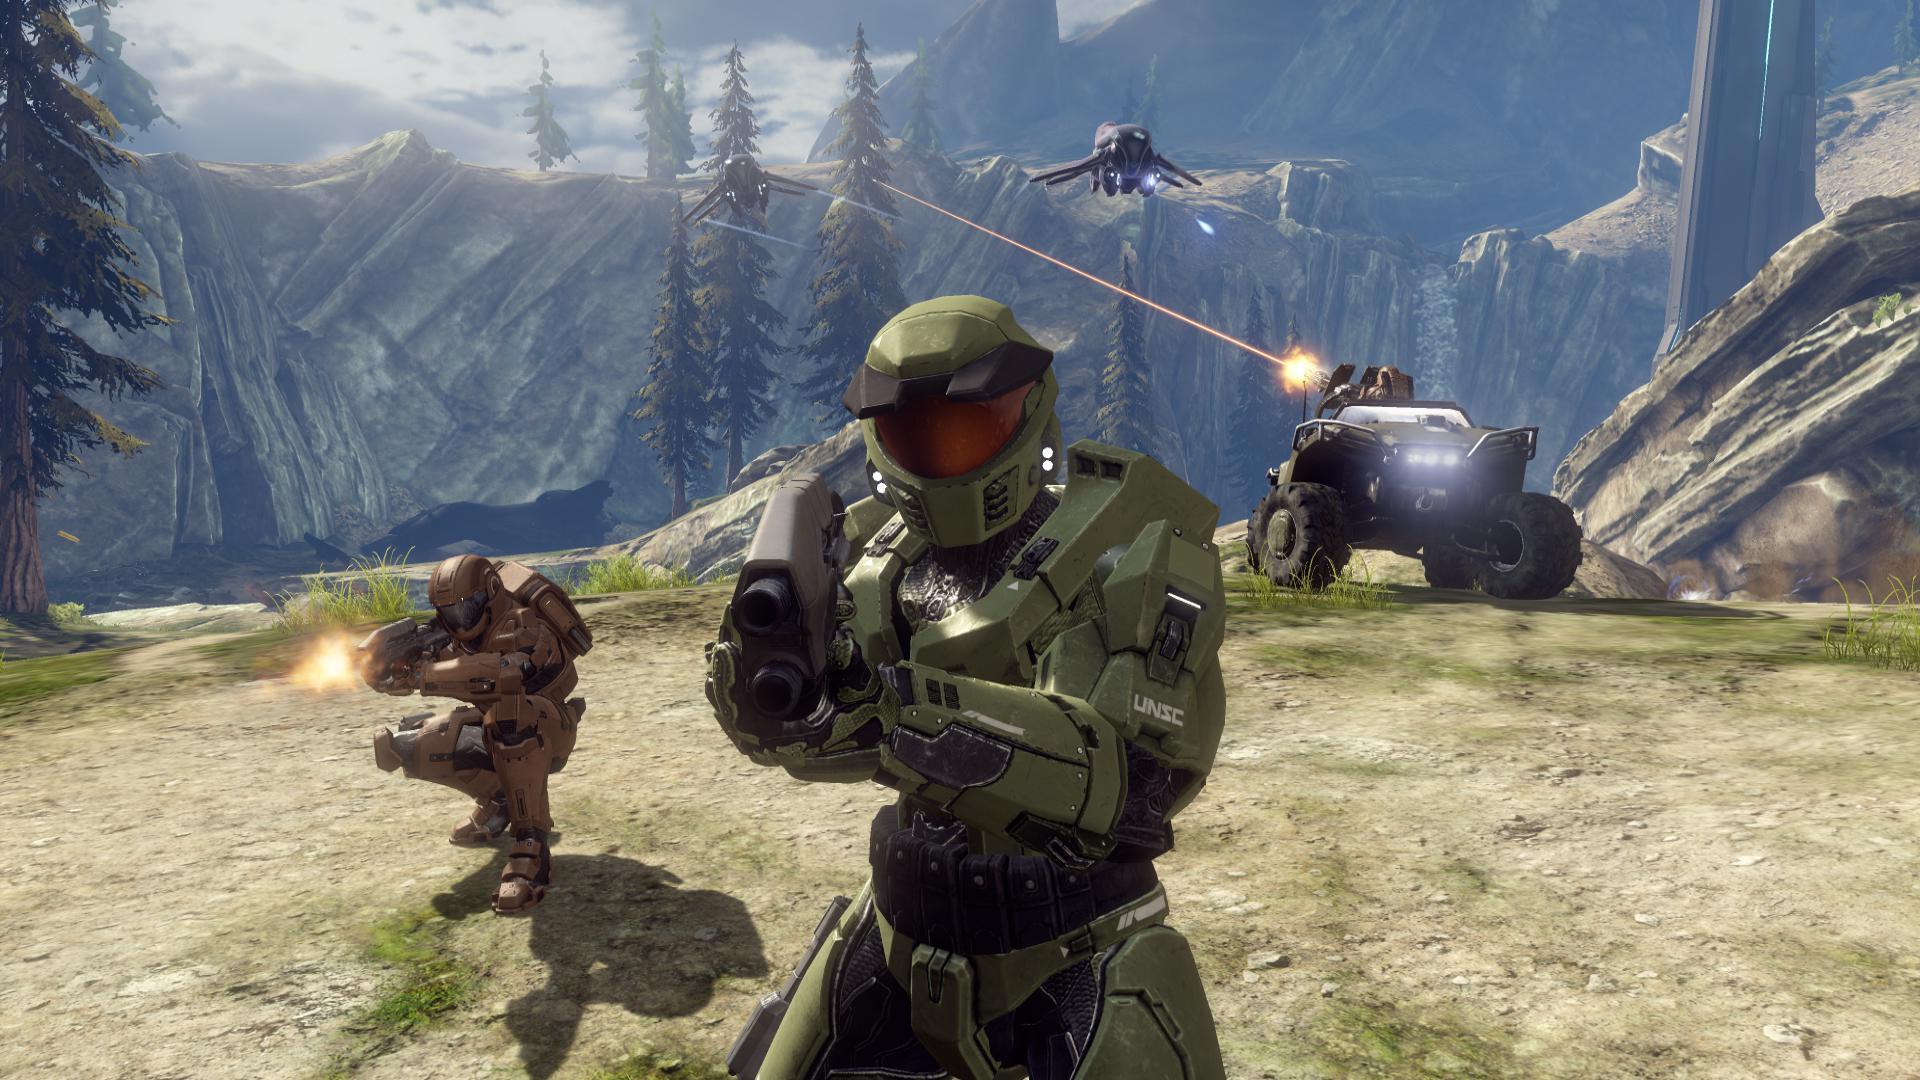 Halo Combat Evolved beta pc